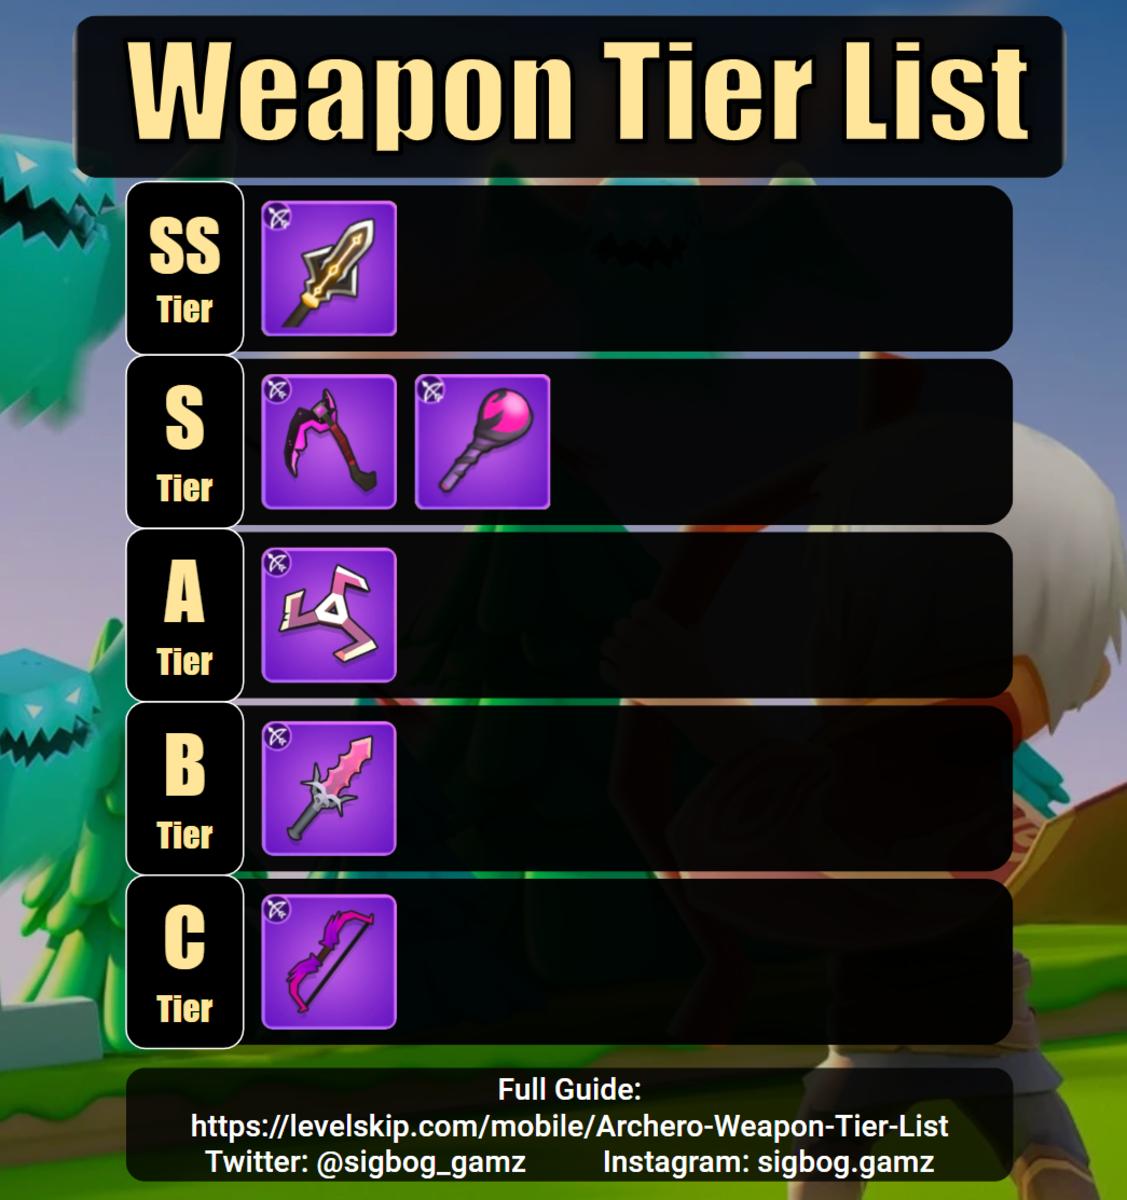 Weapon tier list chart